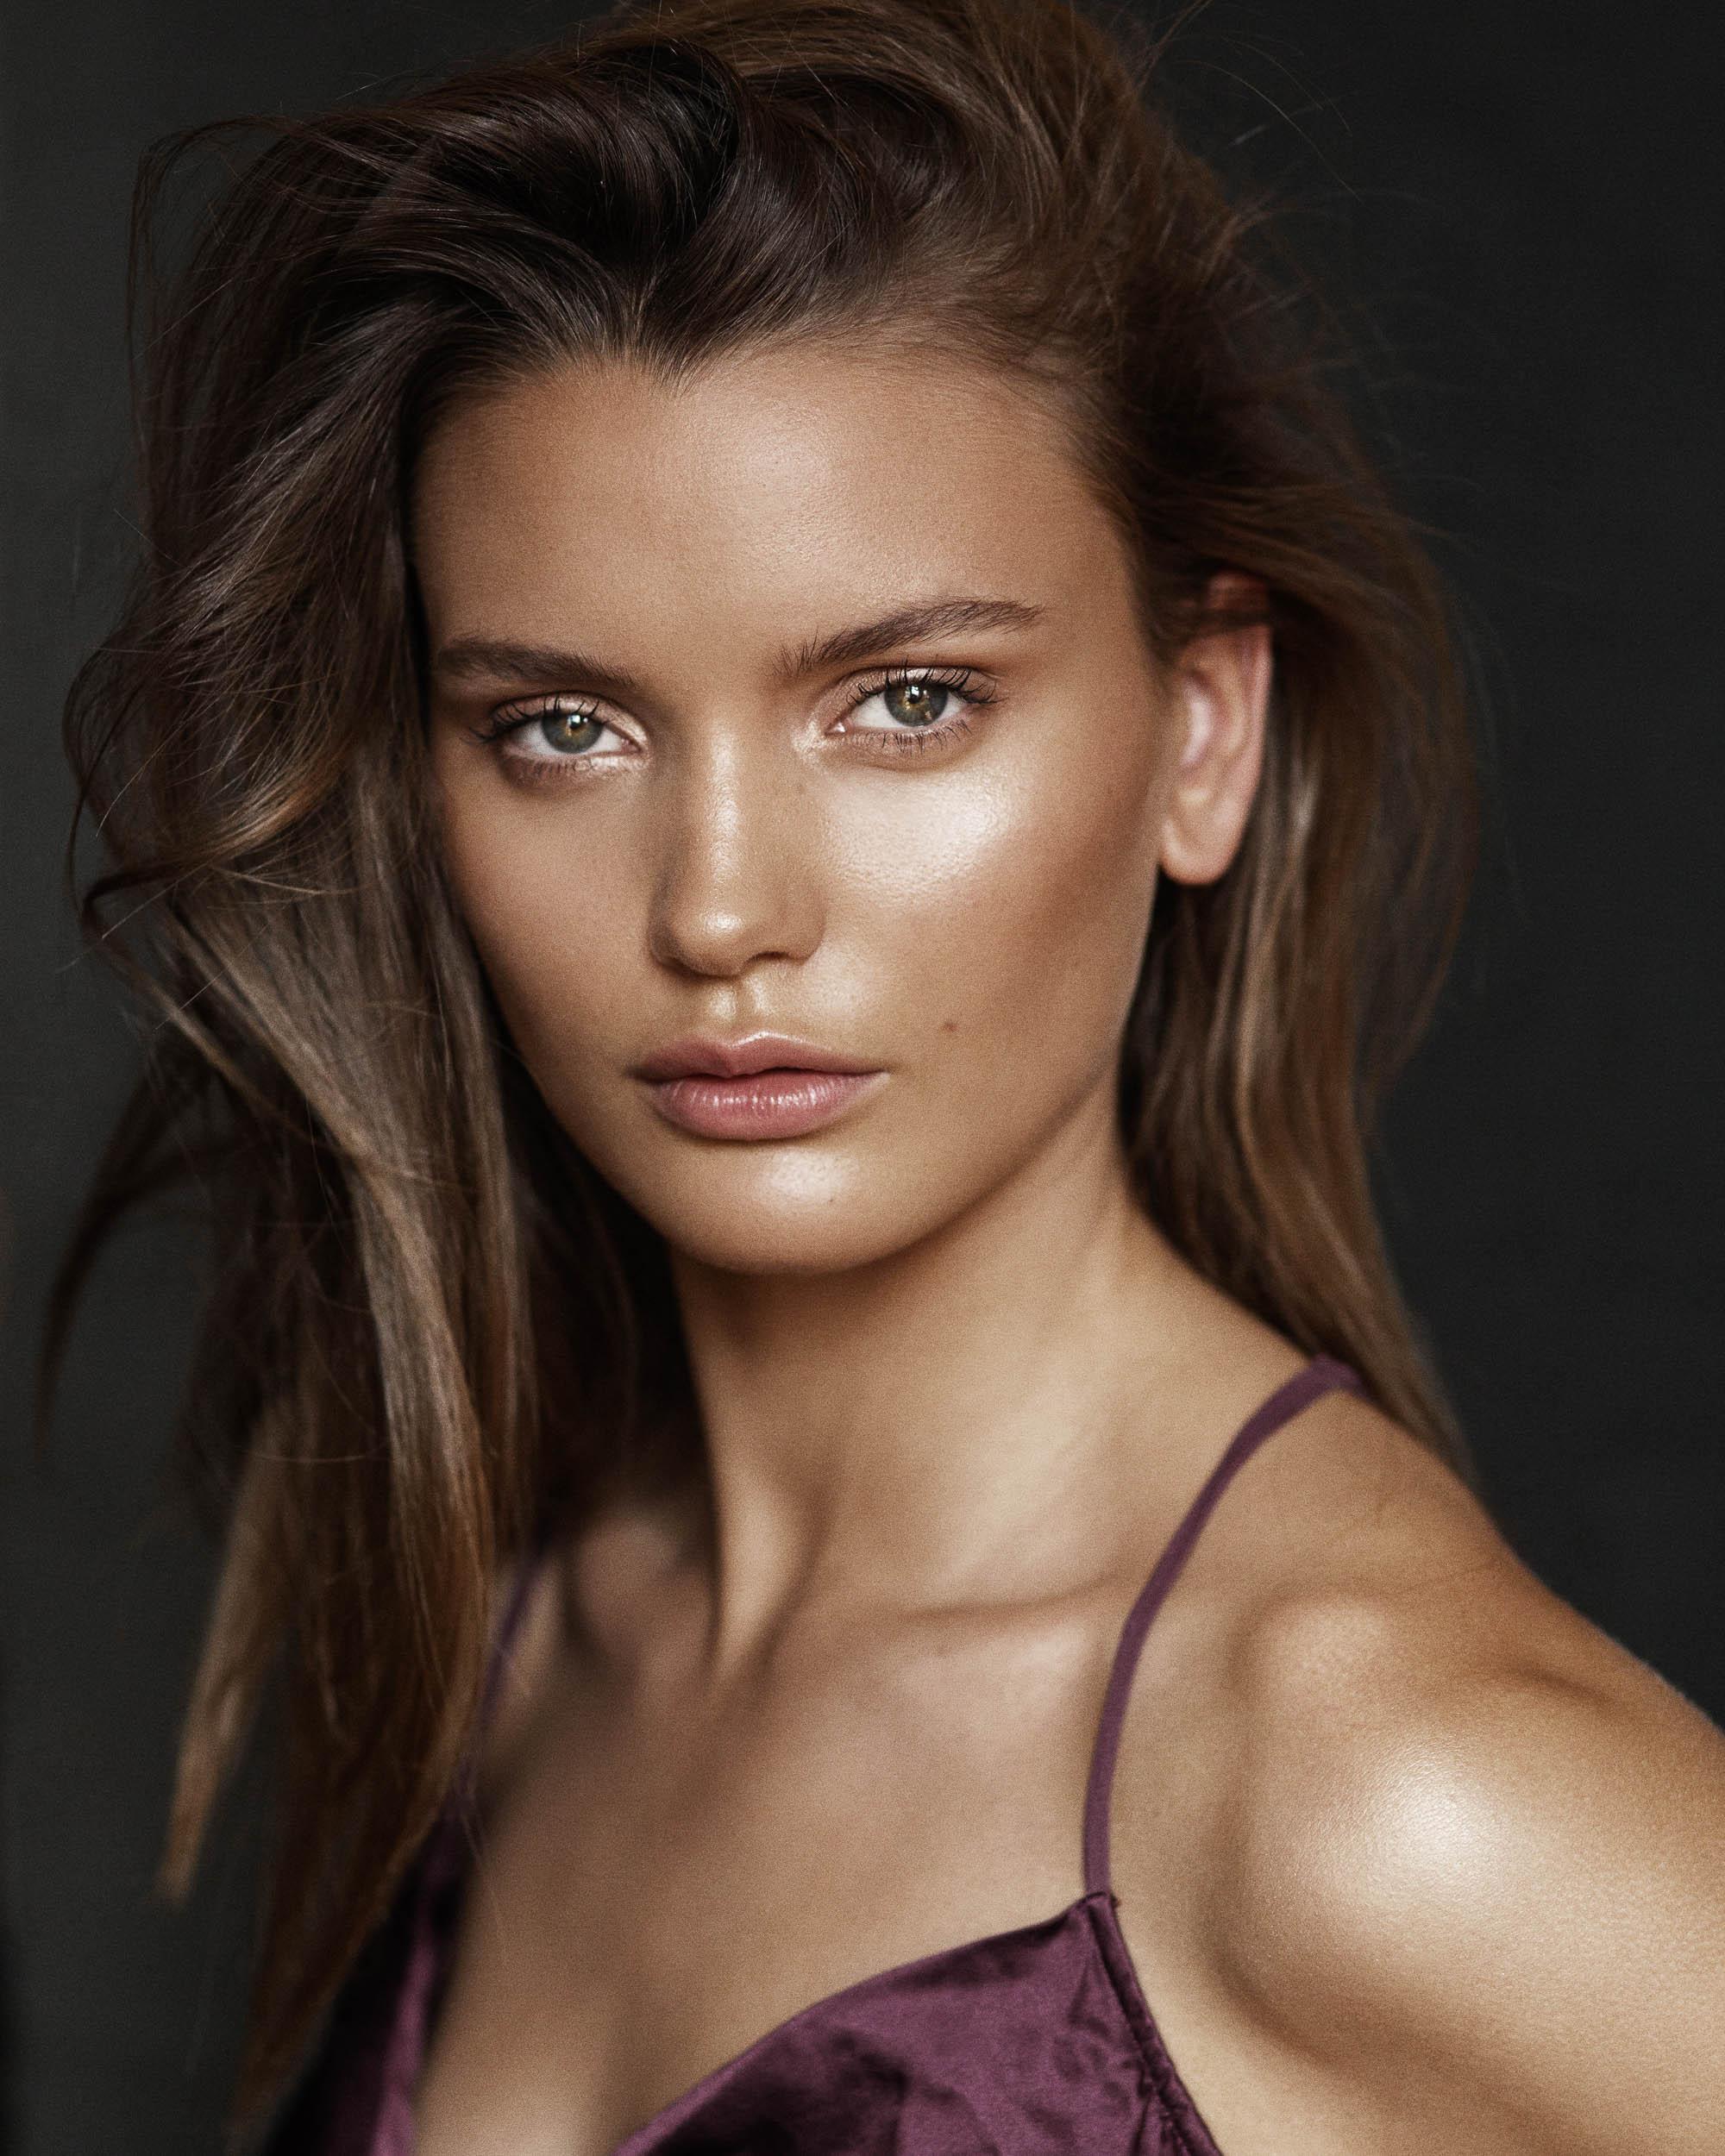 Viviens Model Evie Rorvik photography by Nick Walters.jpg